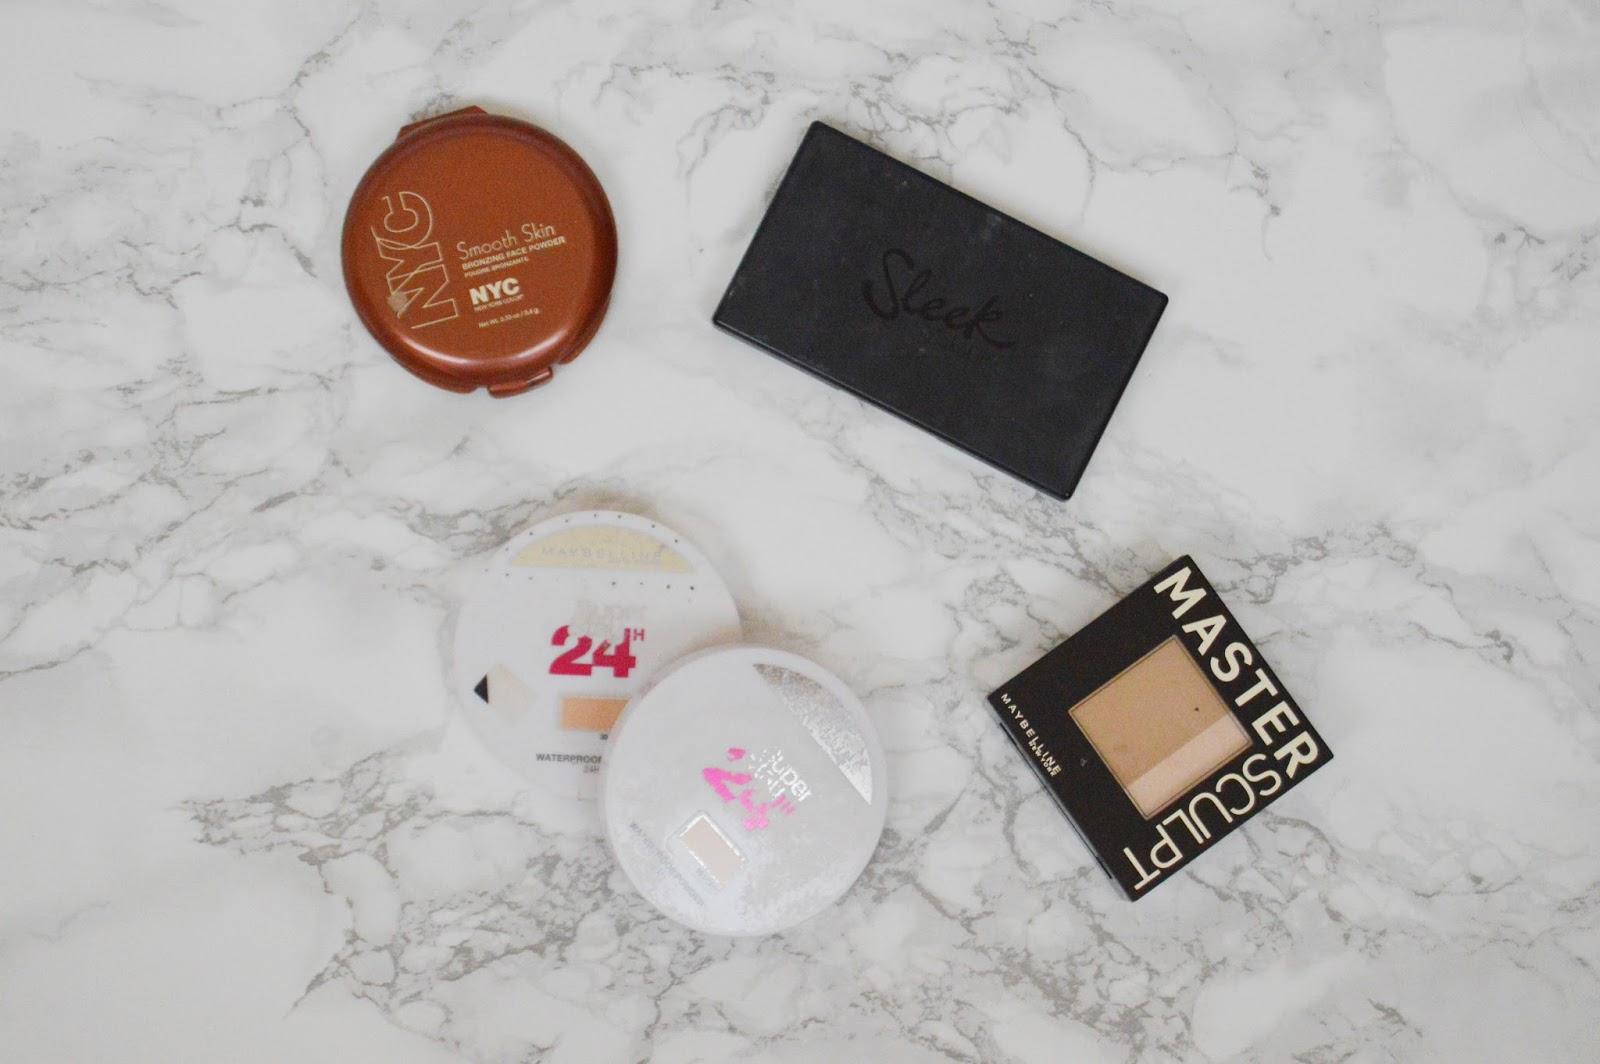 Best Drugstore Contour Powders For Pale Fair Skin Chloe